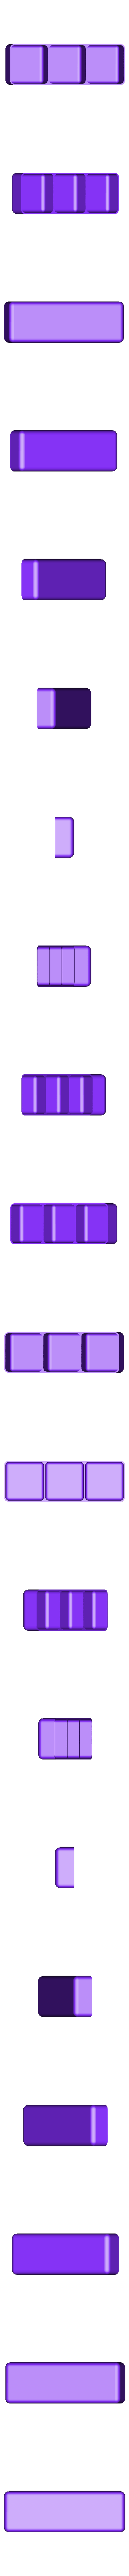 3_x_1_-_24mm_square.stl Download free SCAD file Customizable Square Trays • 3D printer design, WalterHsiao